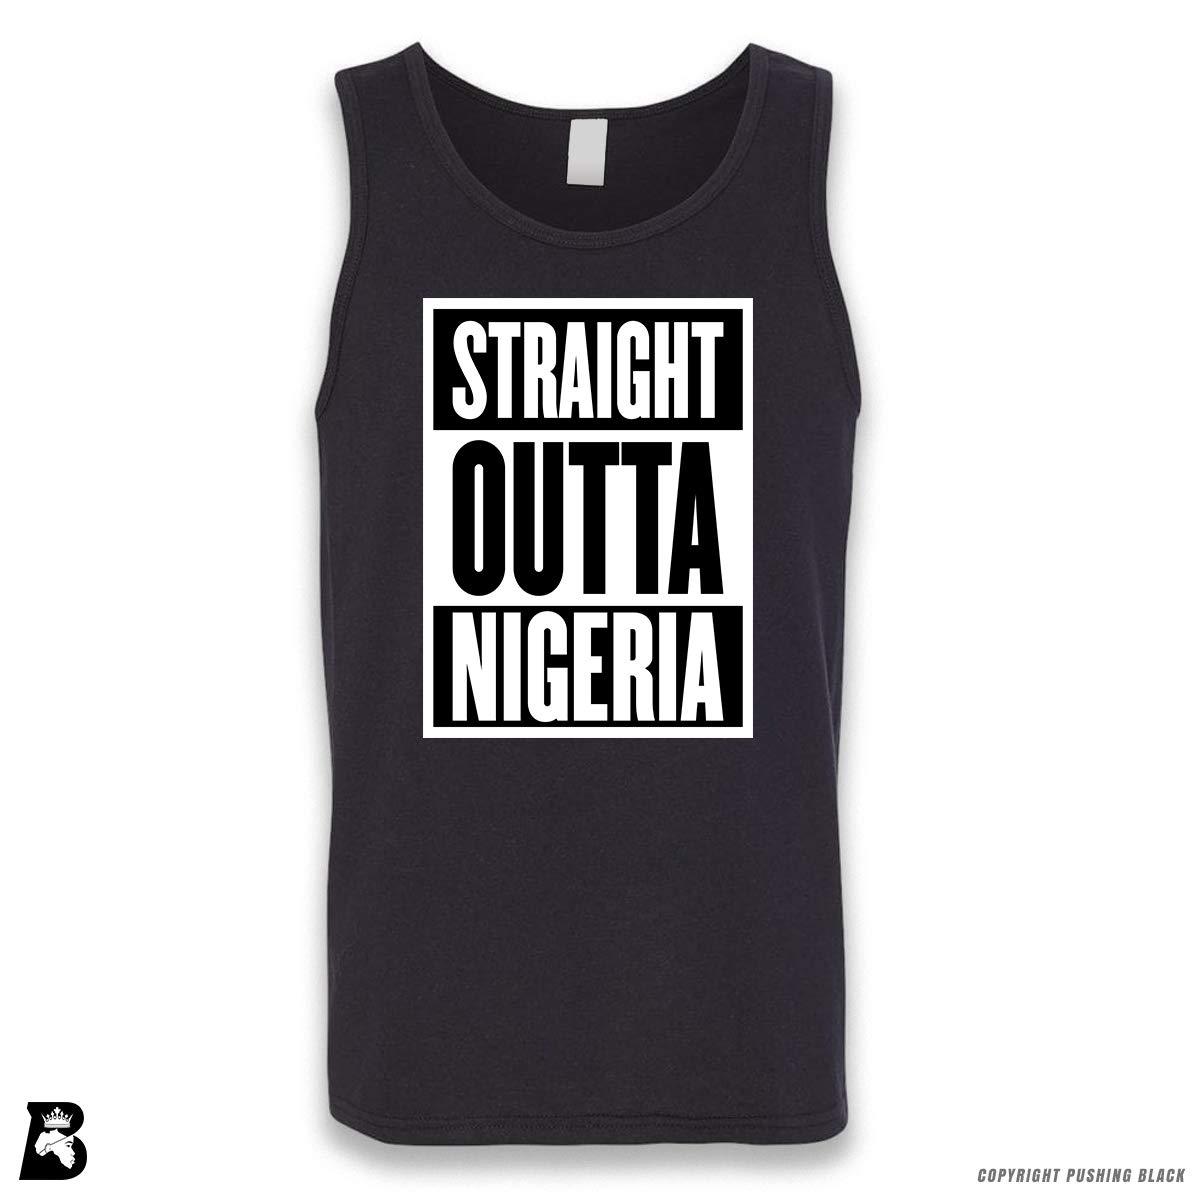 Pushing Black Straight Outta Nigeria Sleeveless Unisex Tank Top